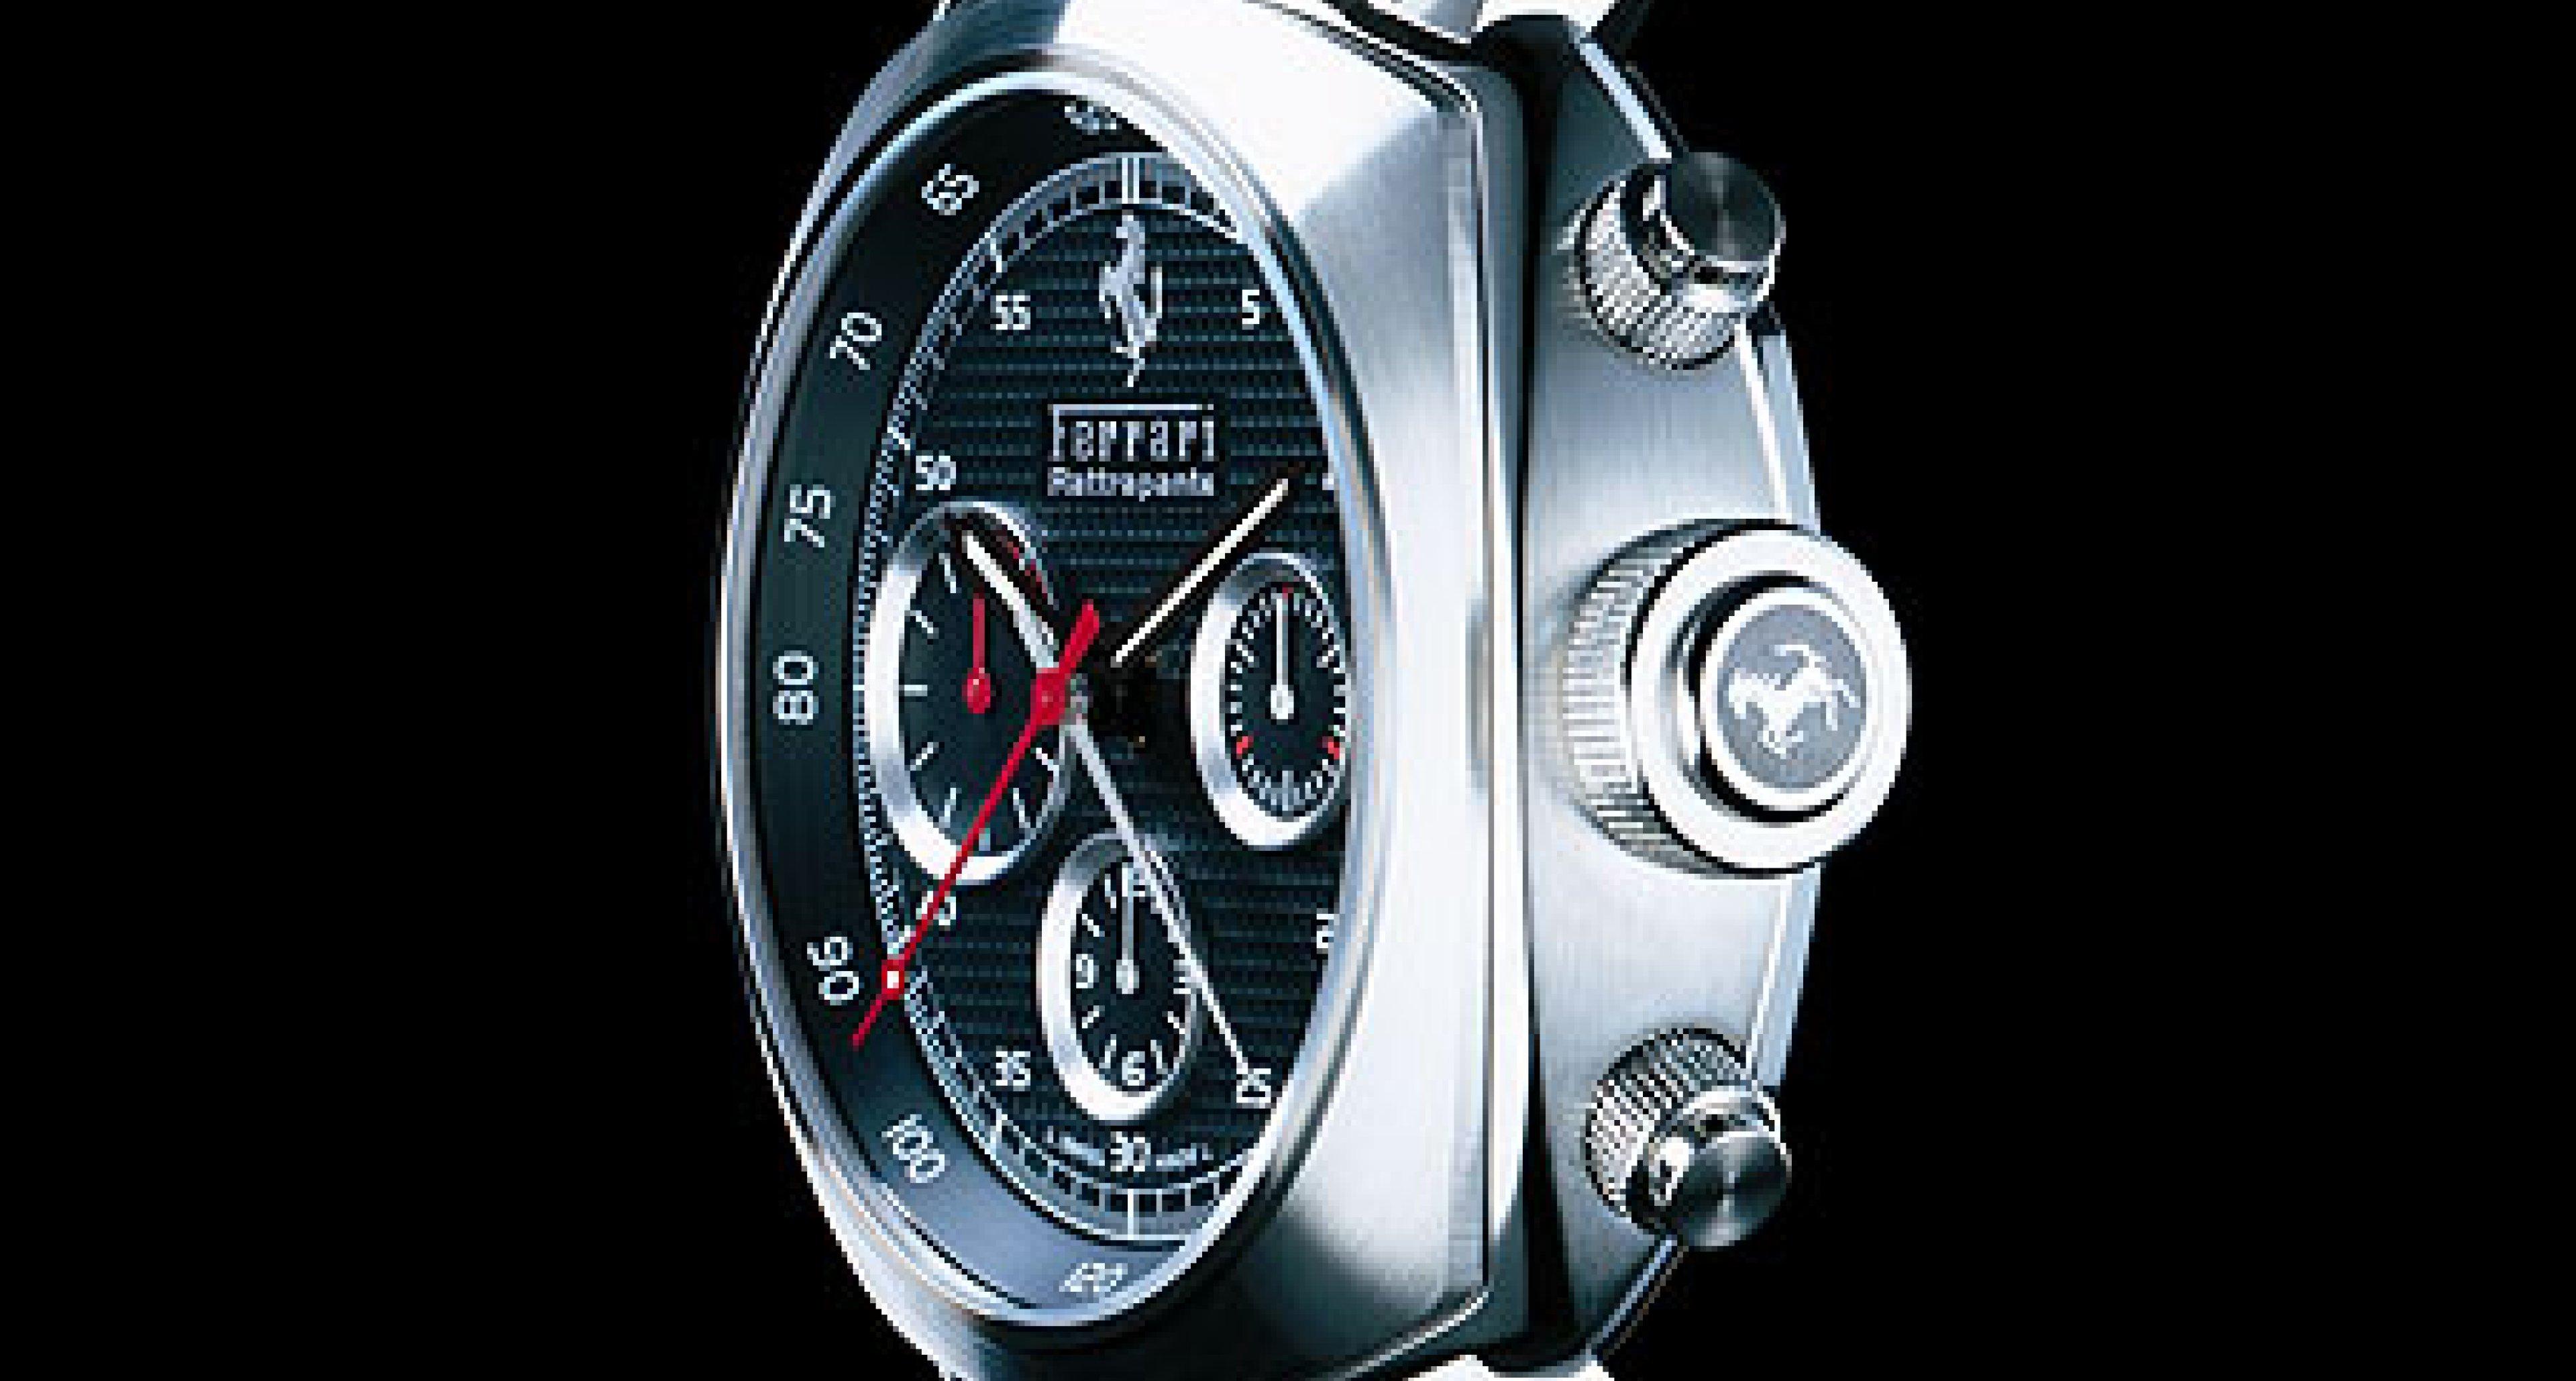 New Ferrari Panerai watches